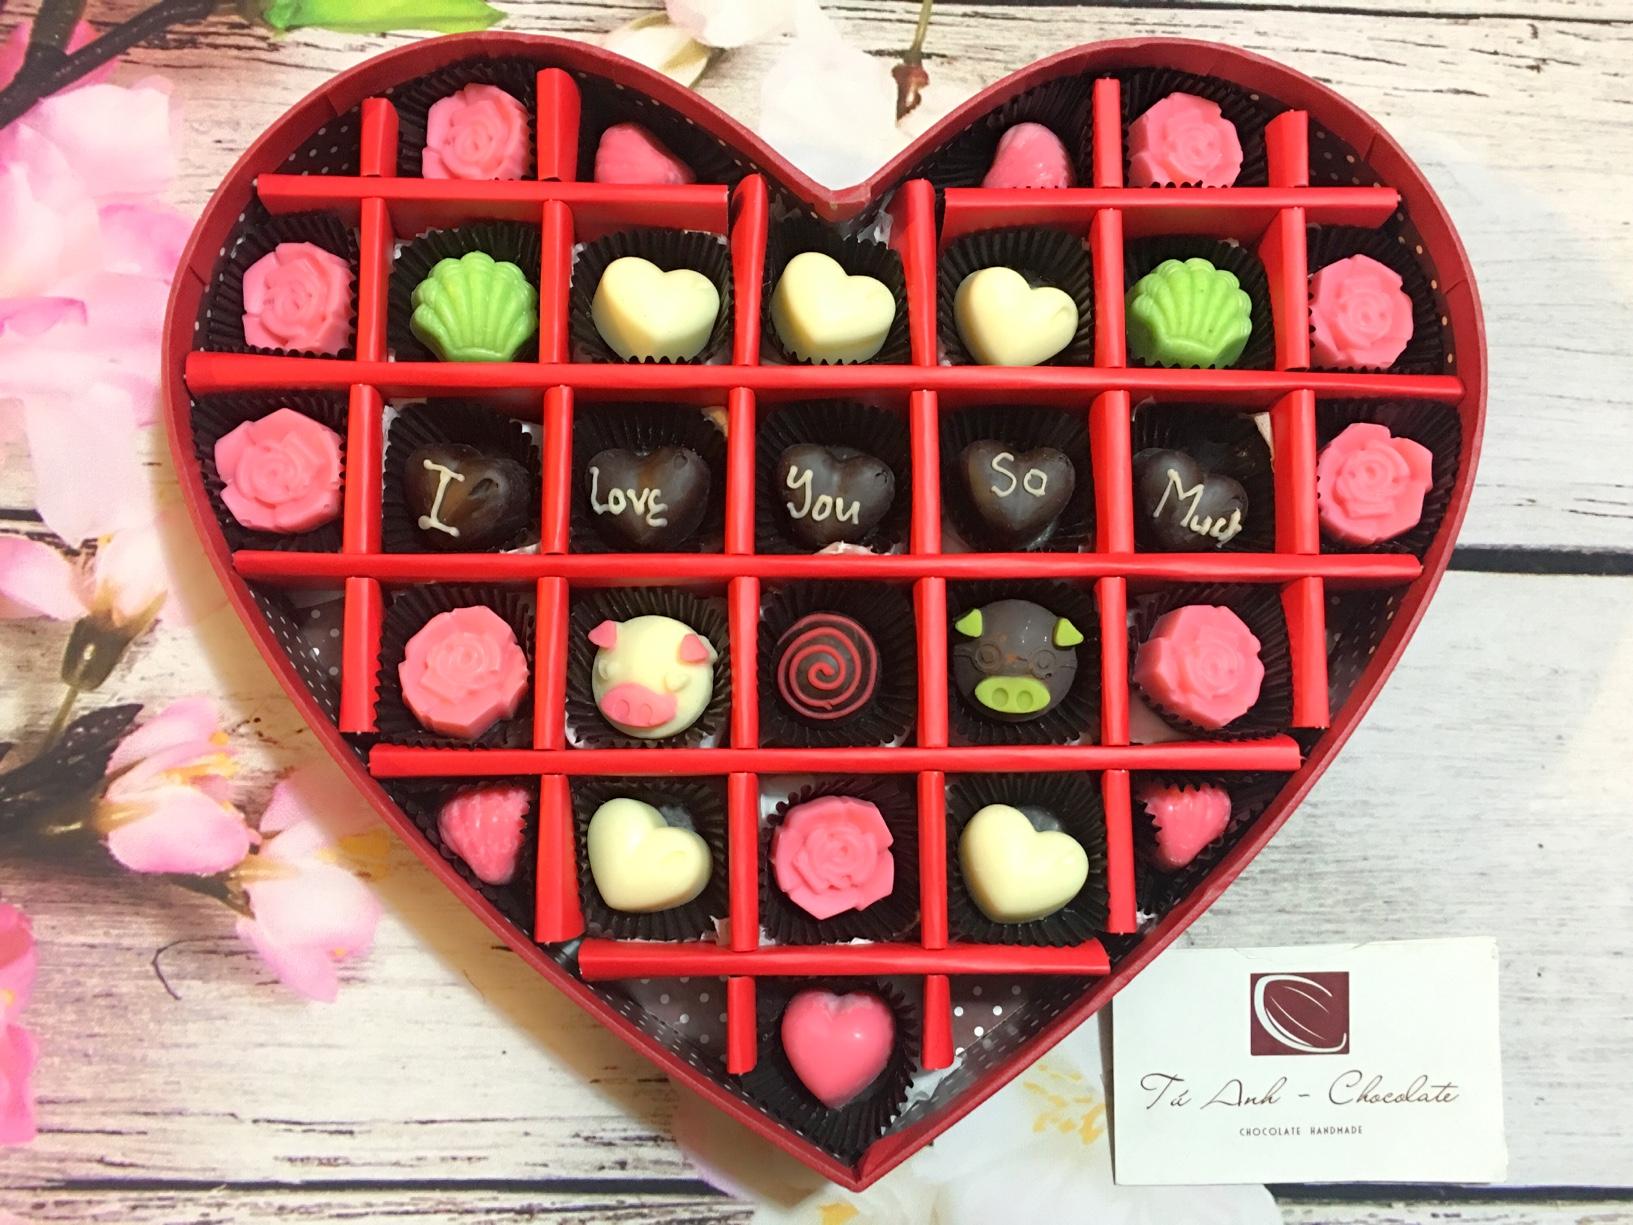 Socola valentine 2019 giá rẻ